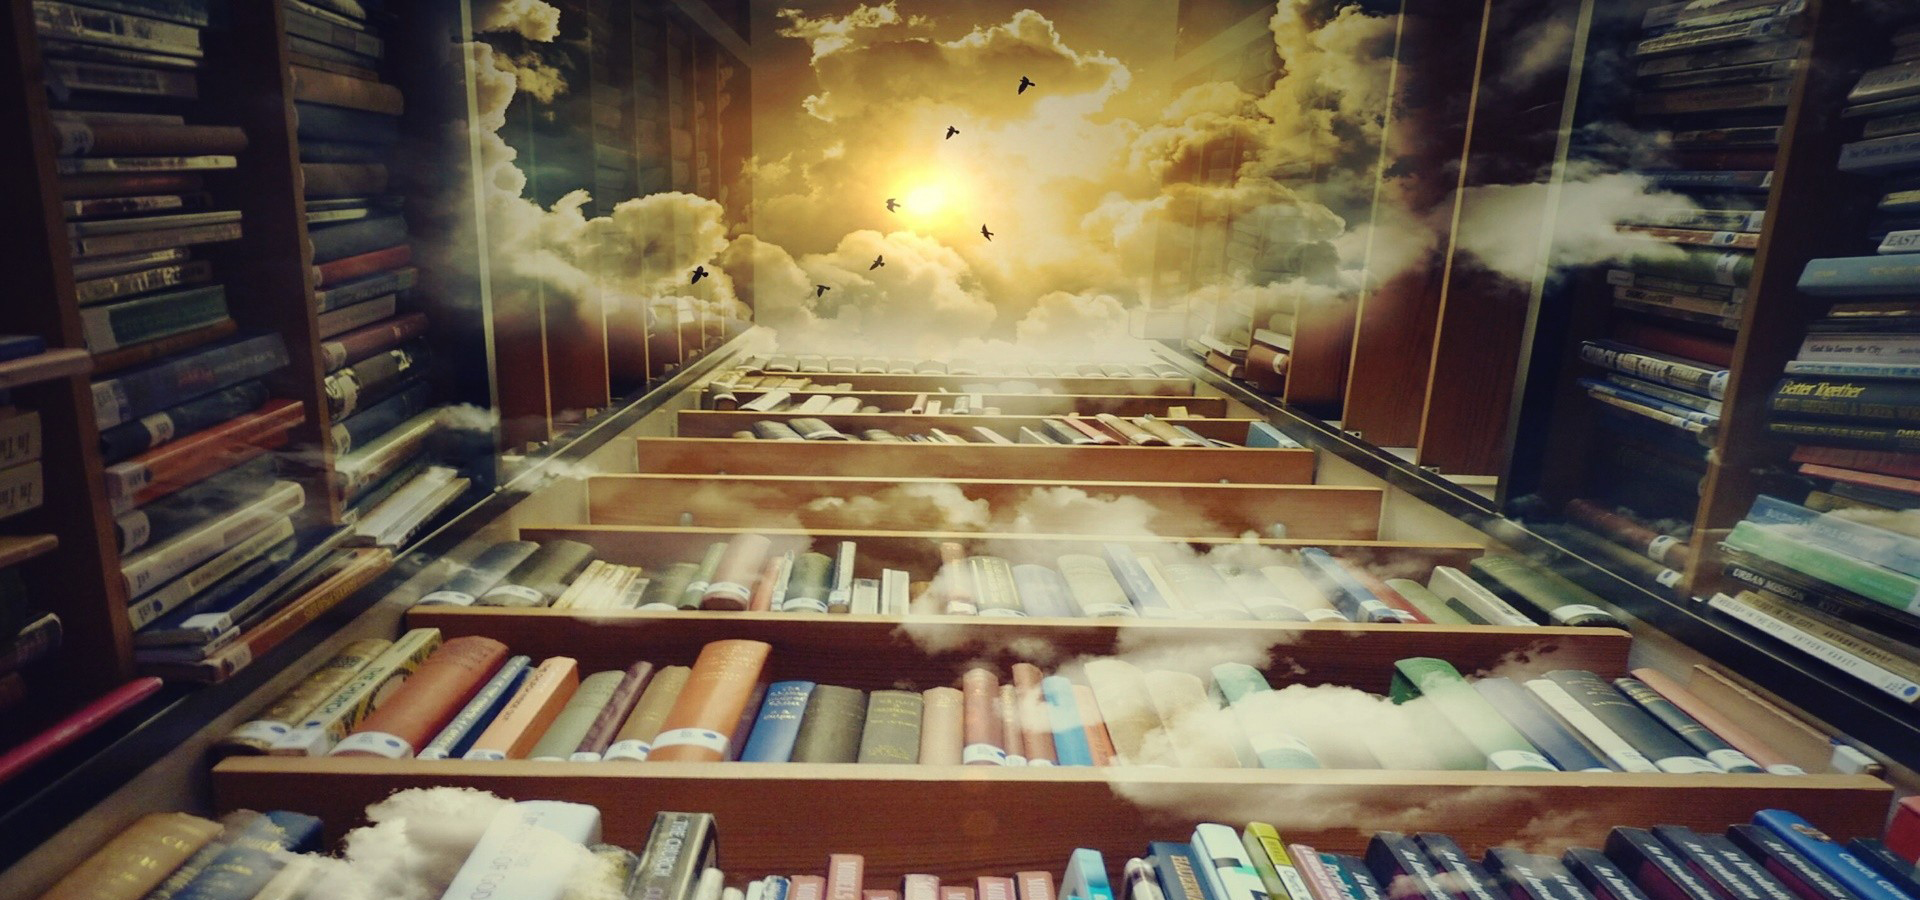 Fantasy Books Background Dream Bookshelf Clouds